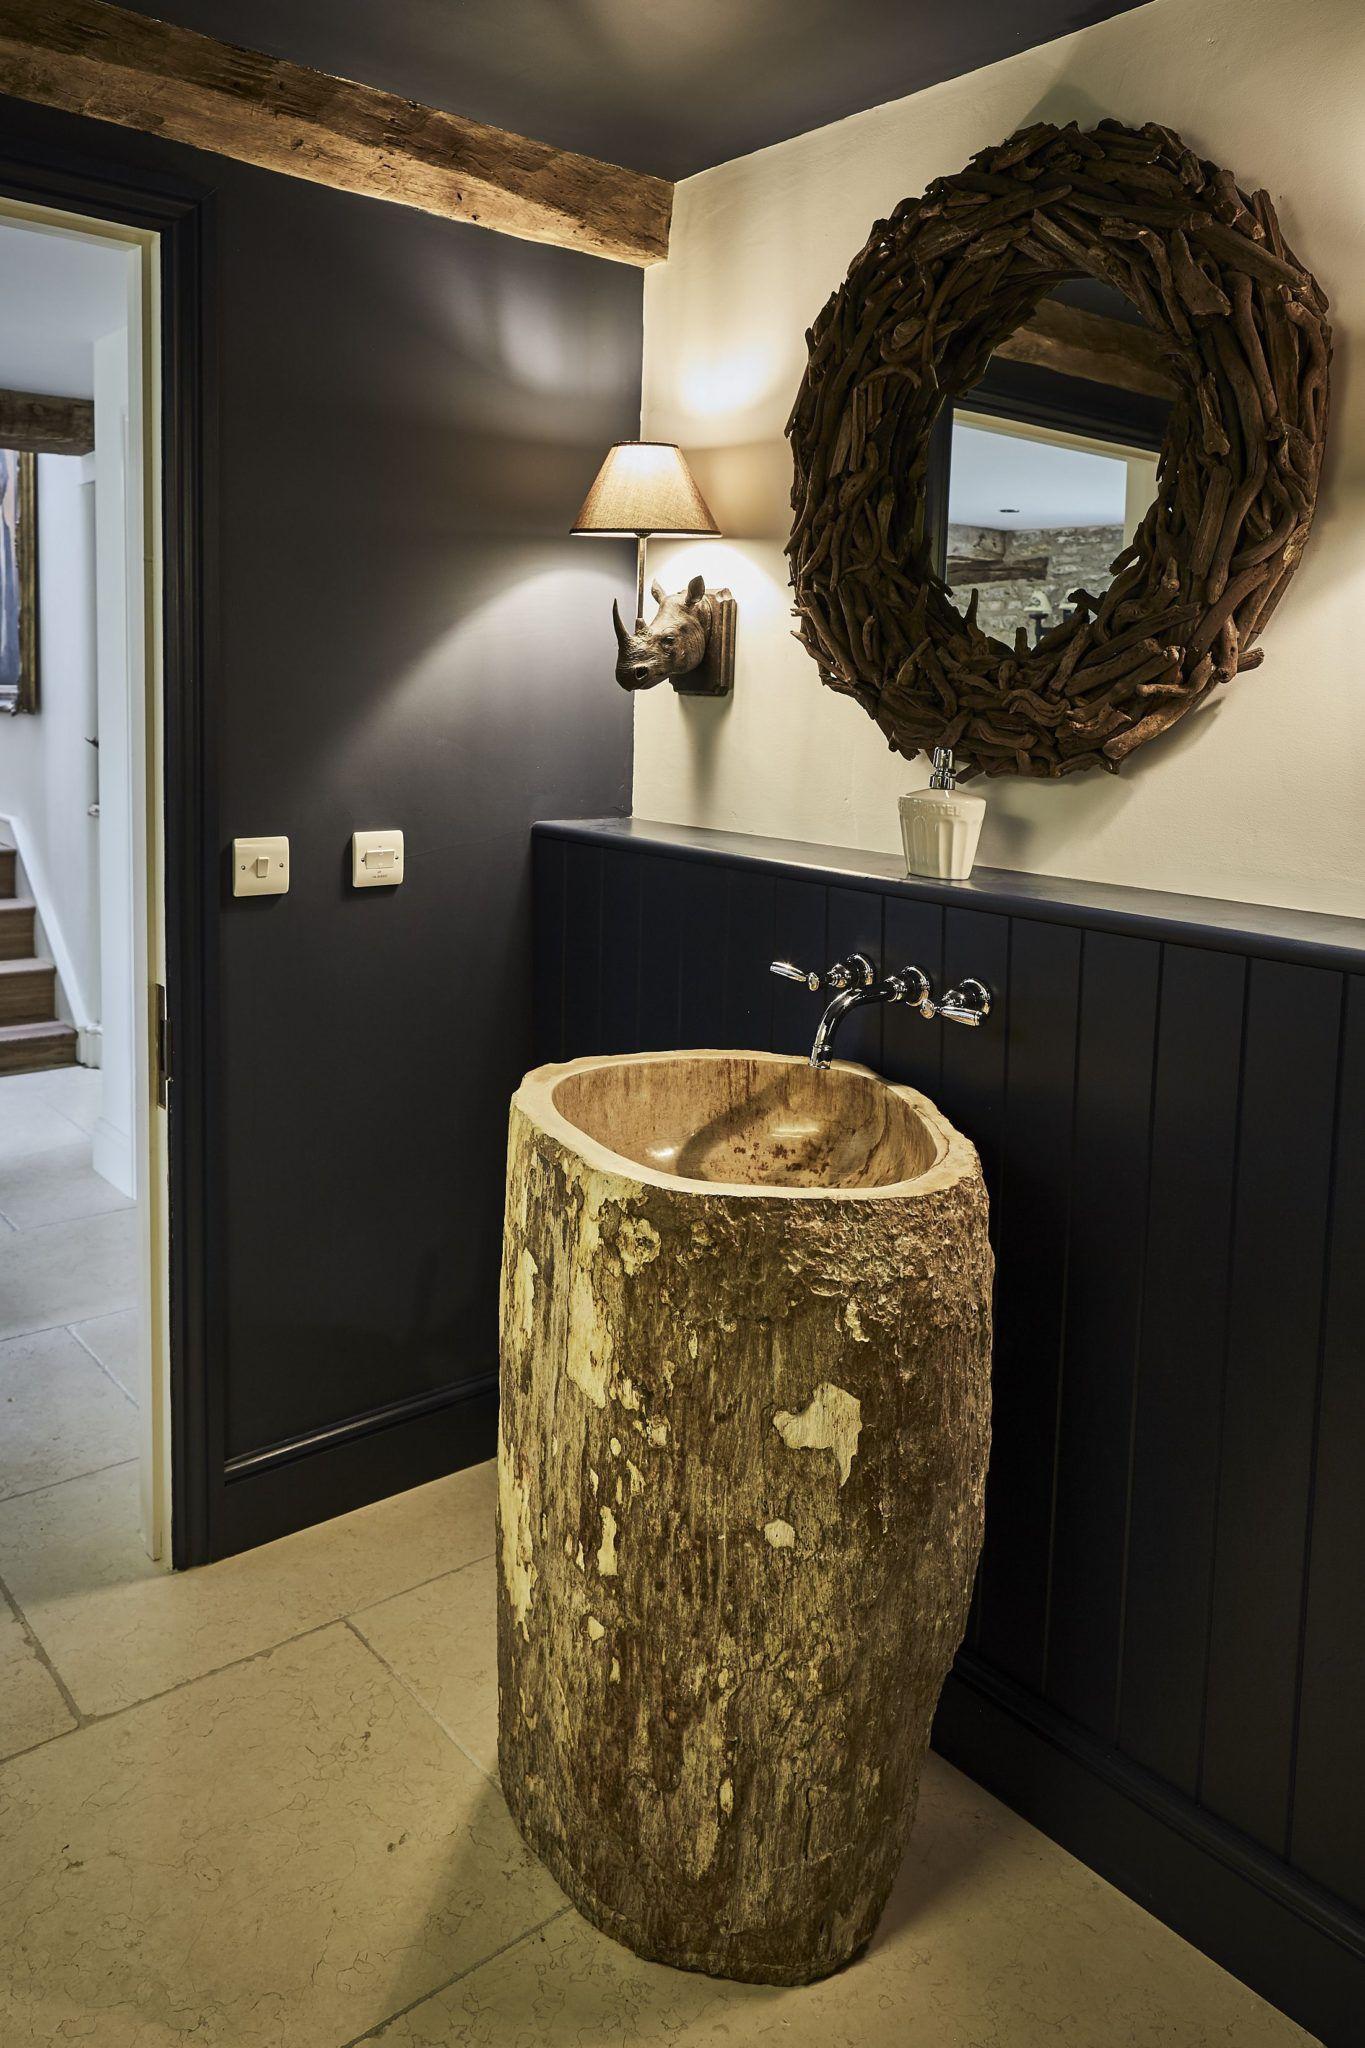 petrified-wood-pedestal-basin-in-situ-1